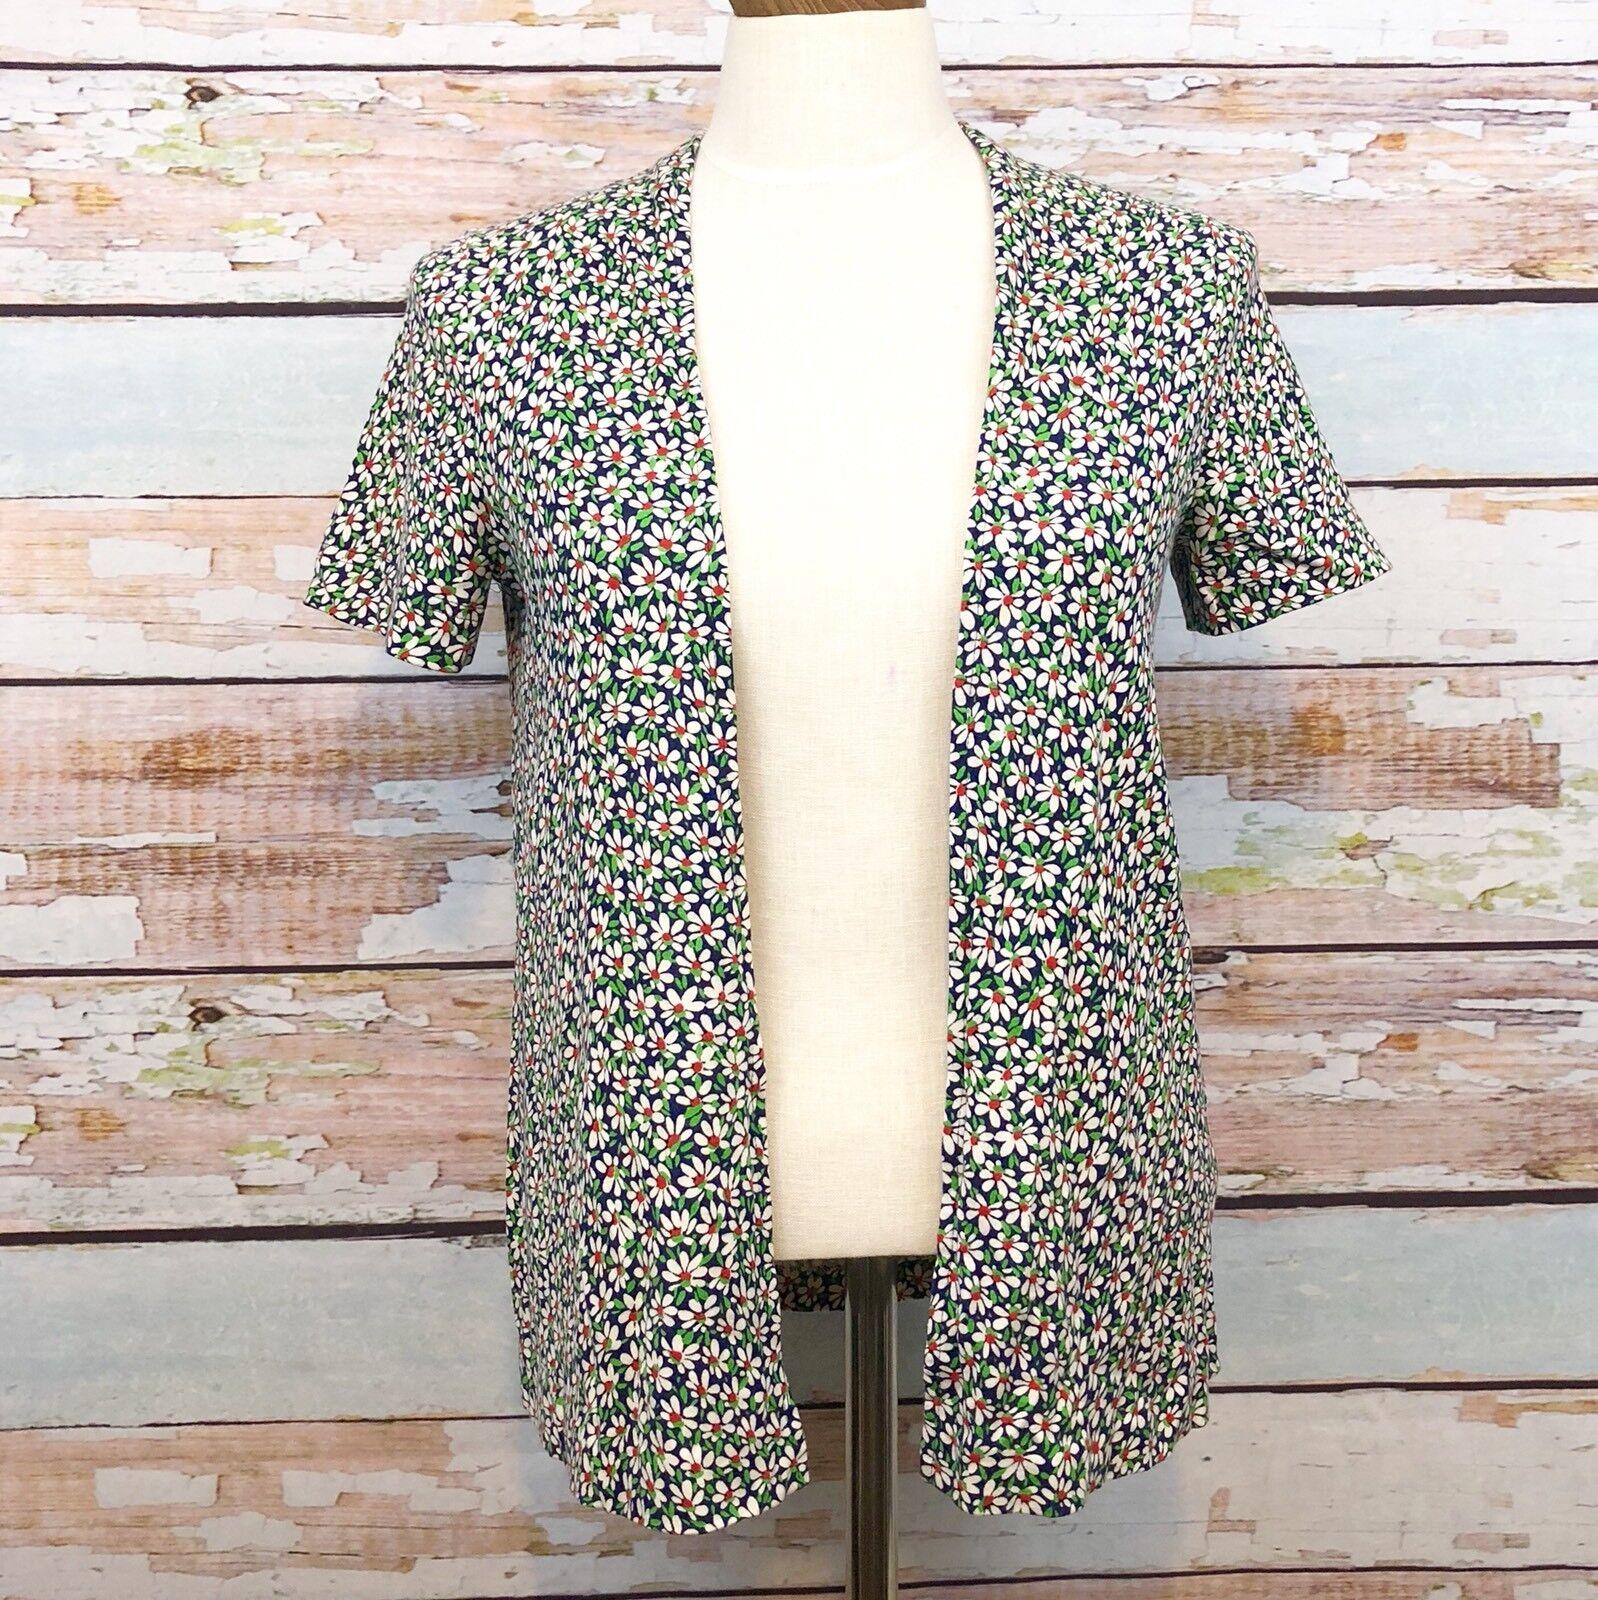 Diane Von Furstenberg Vintage Cotton Cardigan Cardigan Cardigan Coverup Floral Daisy Print Size 10 64fa21